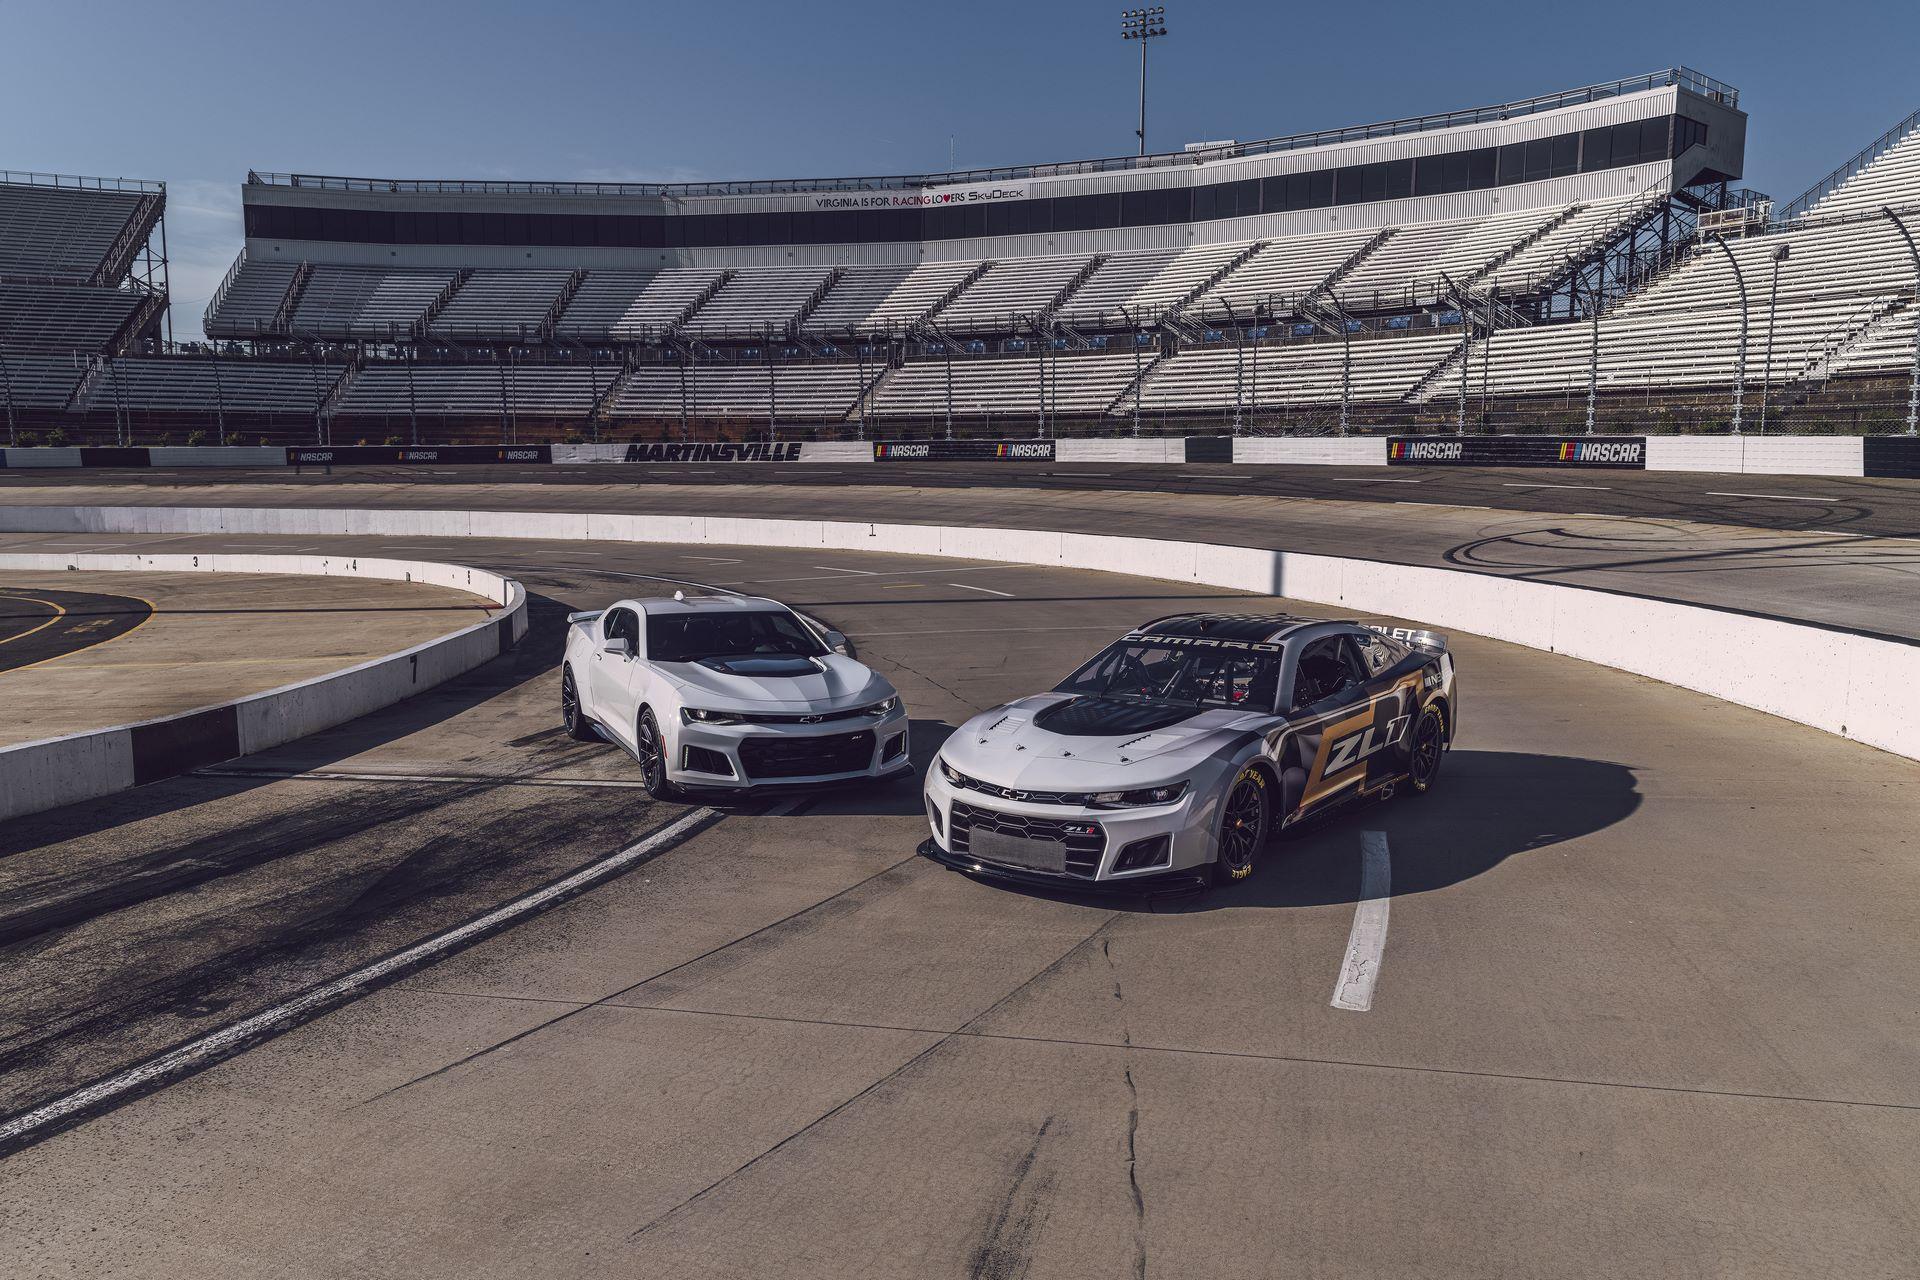 Chevrolet-Camaro-ZL1-RaceCarr-Next-Gen-Nascar-1